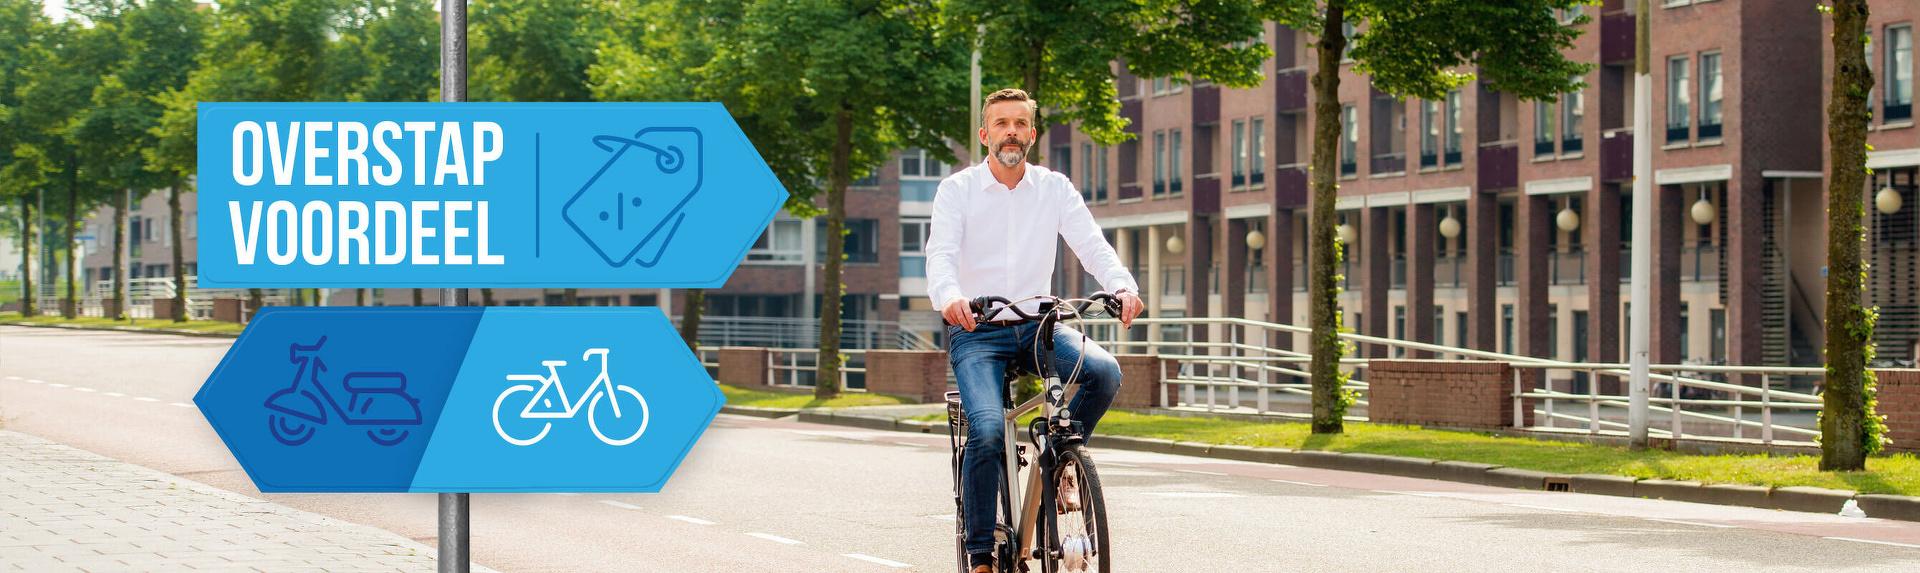 E-bike subsidie Amsterdam